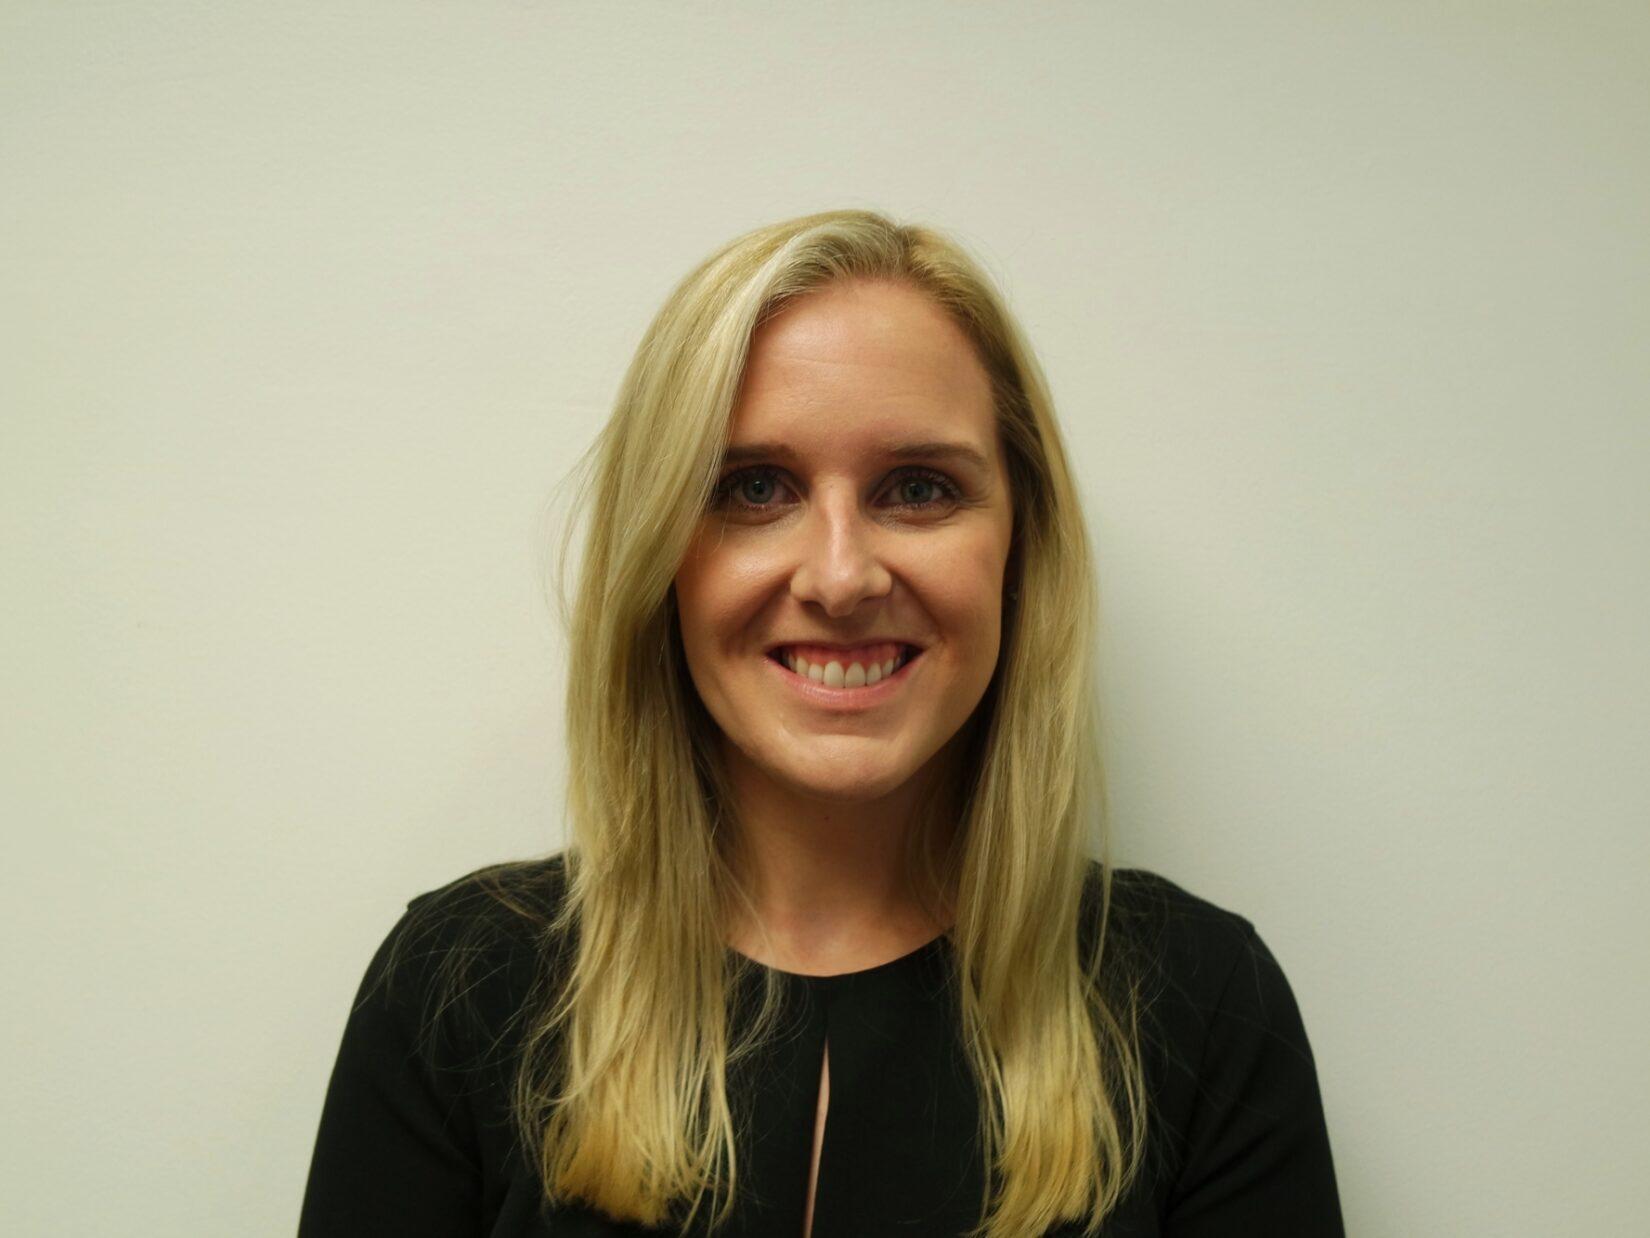 Portrait image of Sarah Tracy